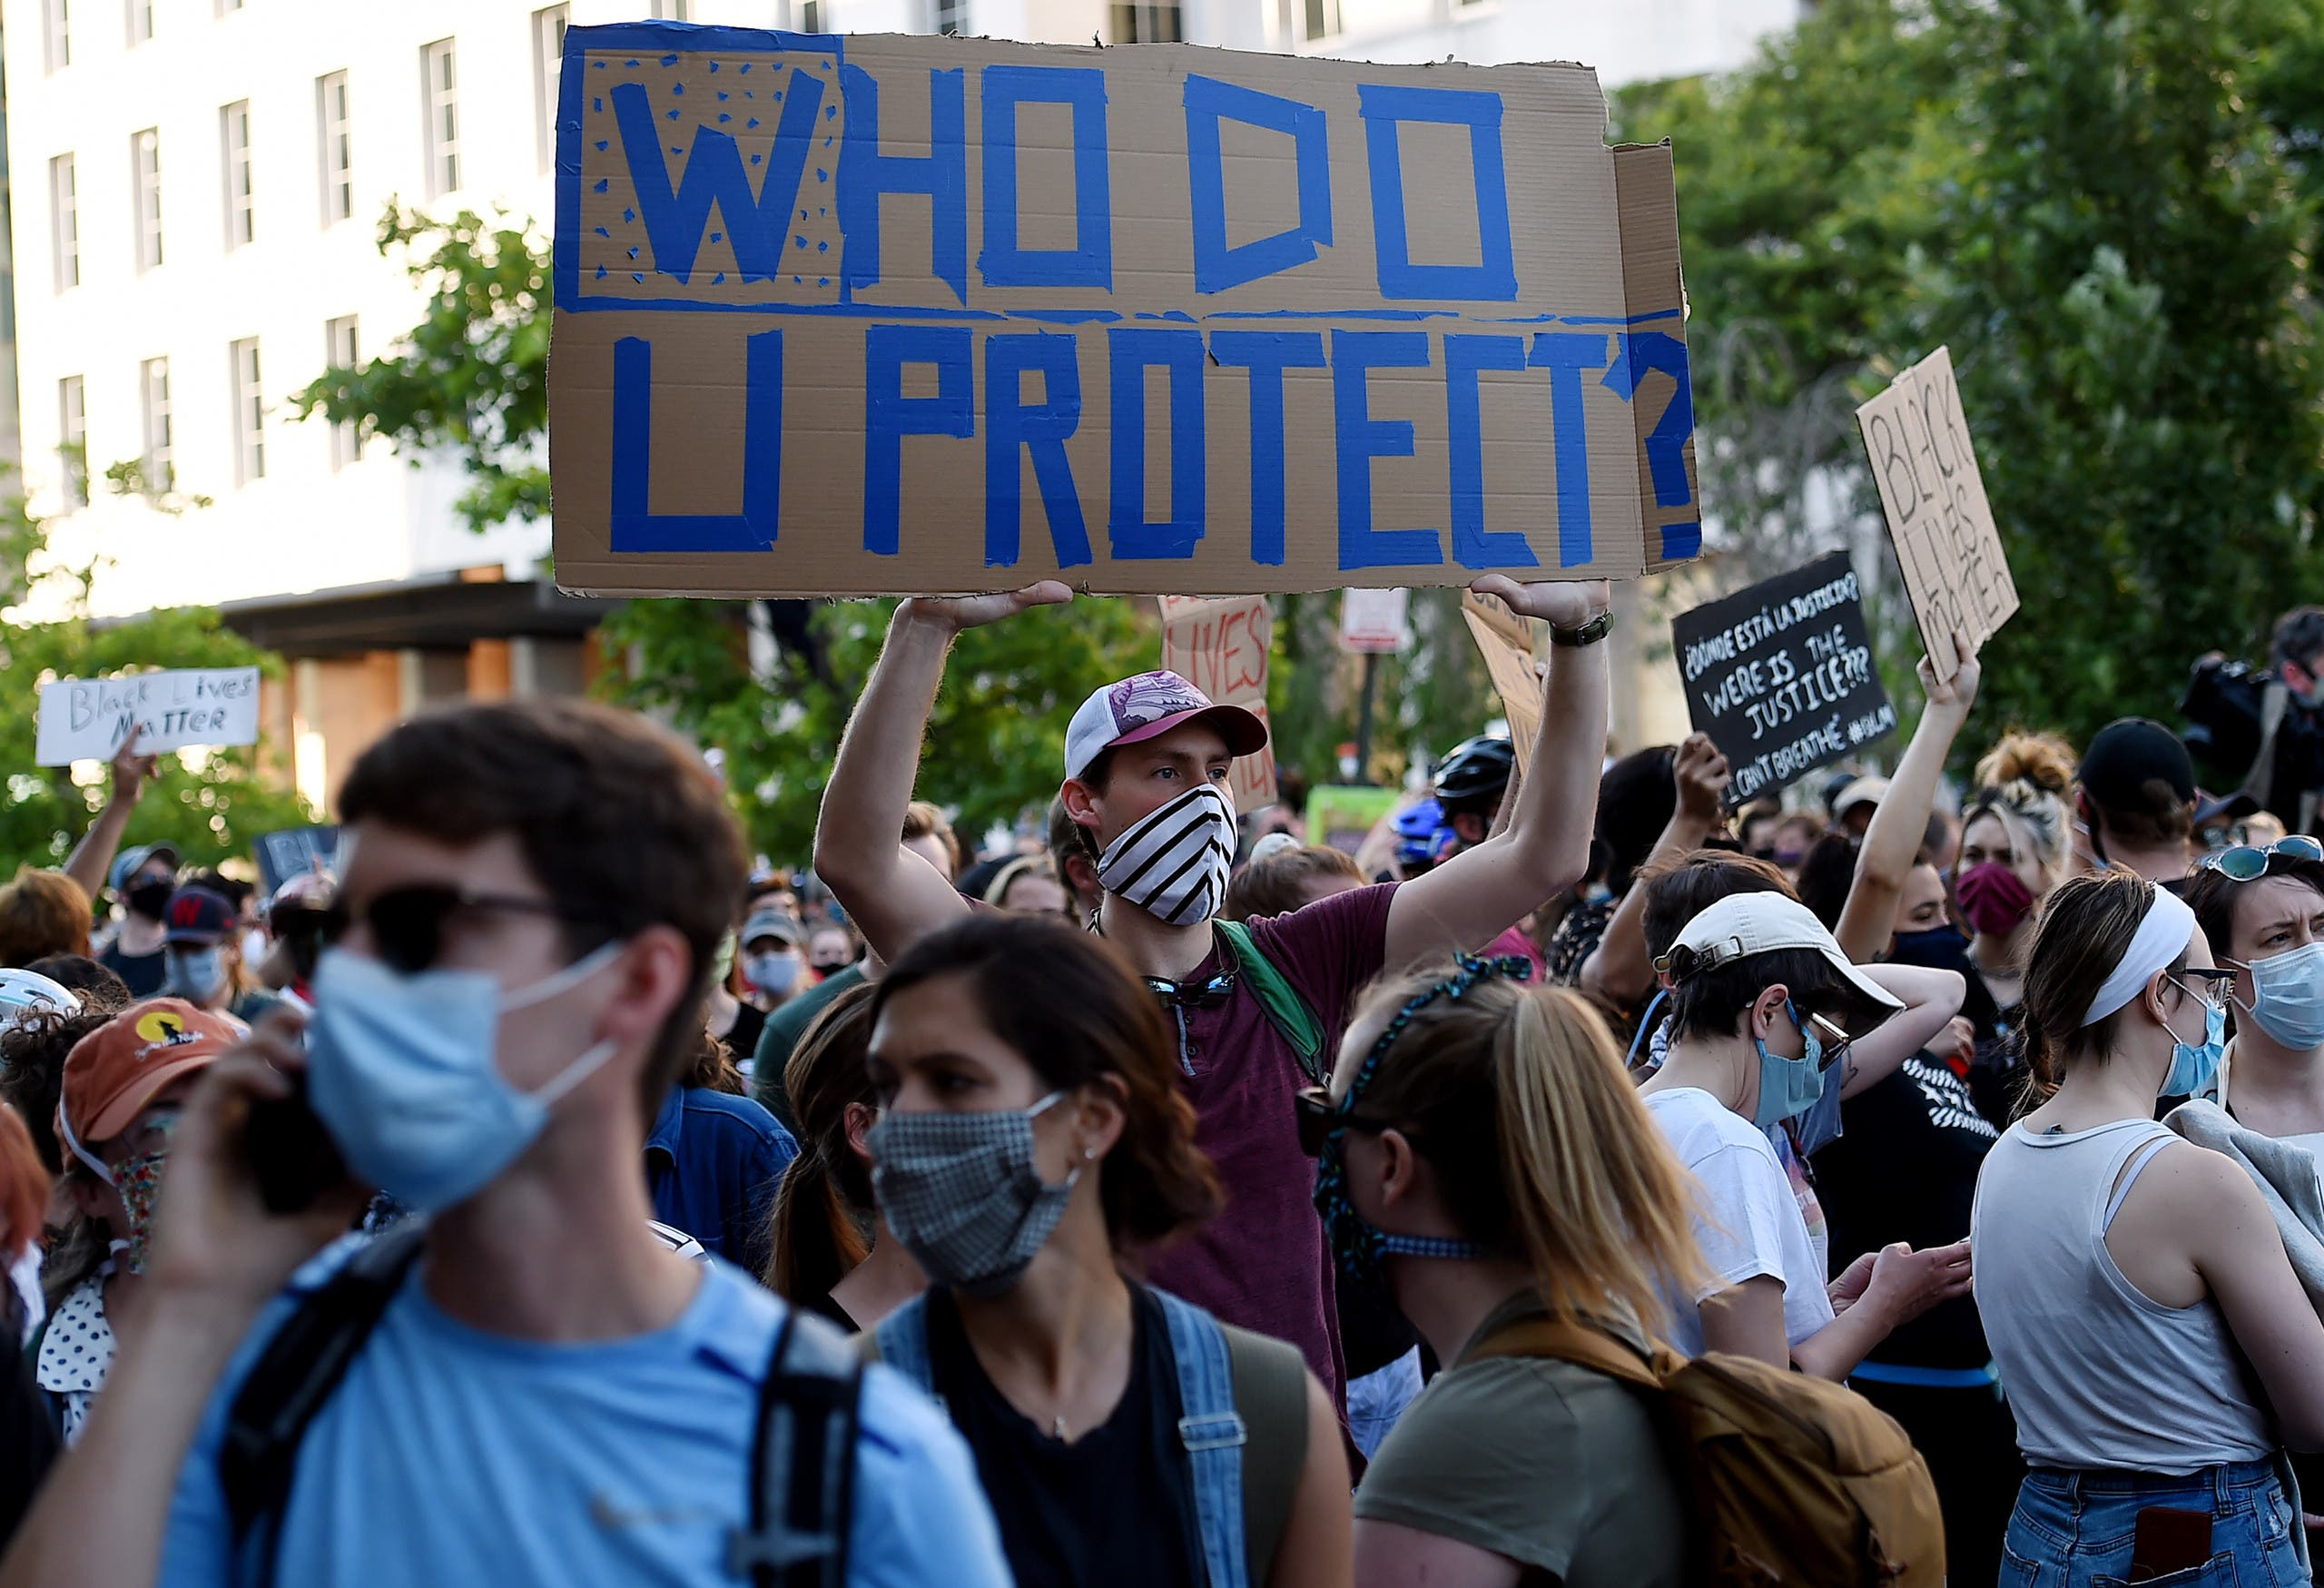 تظاهرات في  واشنطن(فرانس برس)